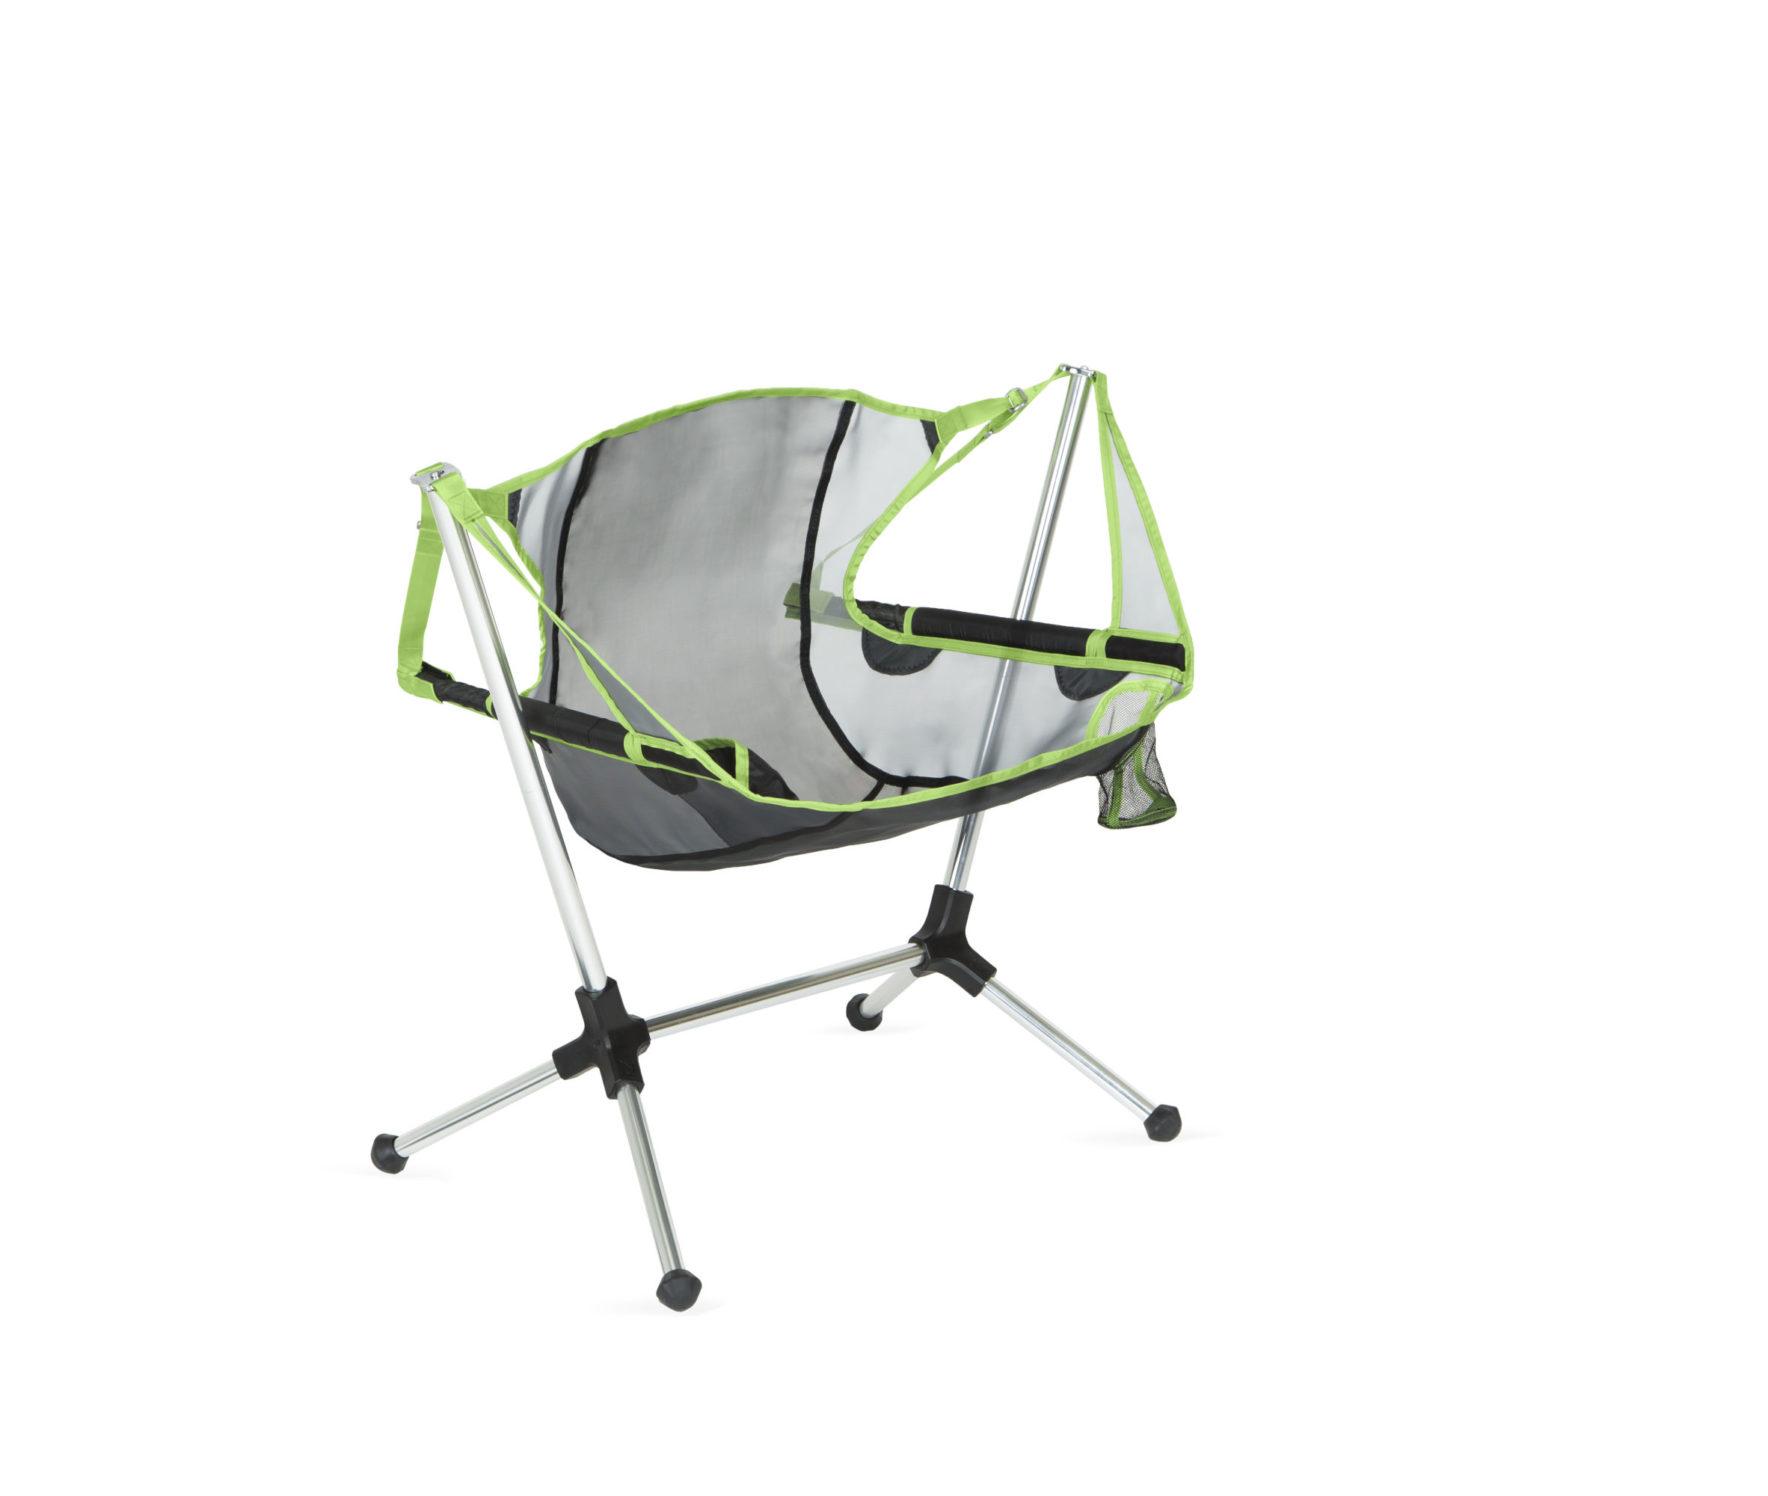 Enjoyable Nemo Equipment Stargaze Recliner Lite Camping Chair Creativecarmelina Interior Chair Design Creativecarmelinacom